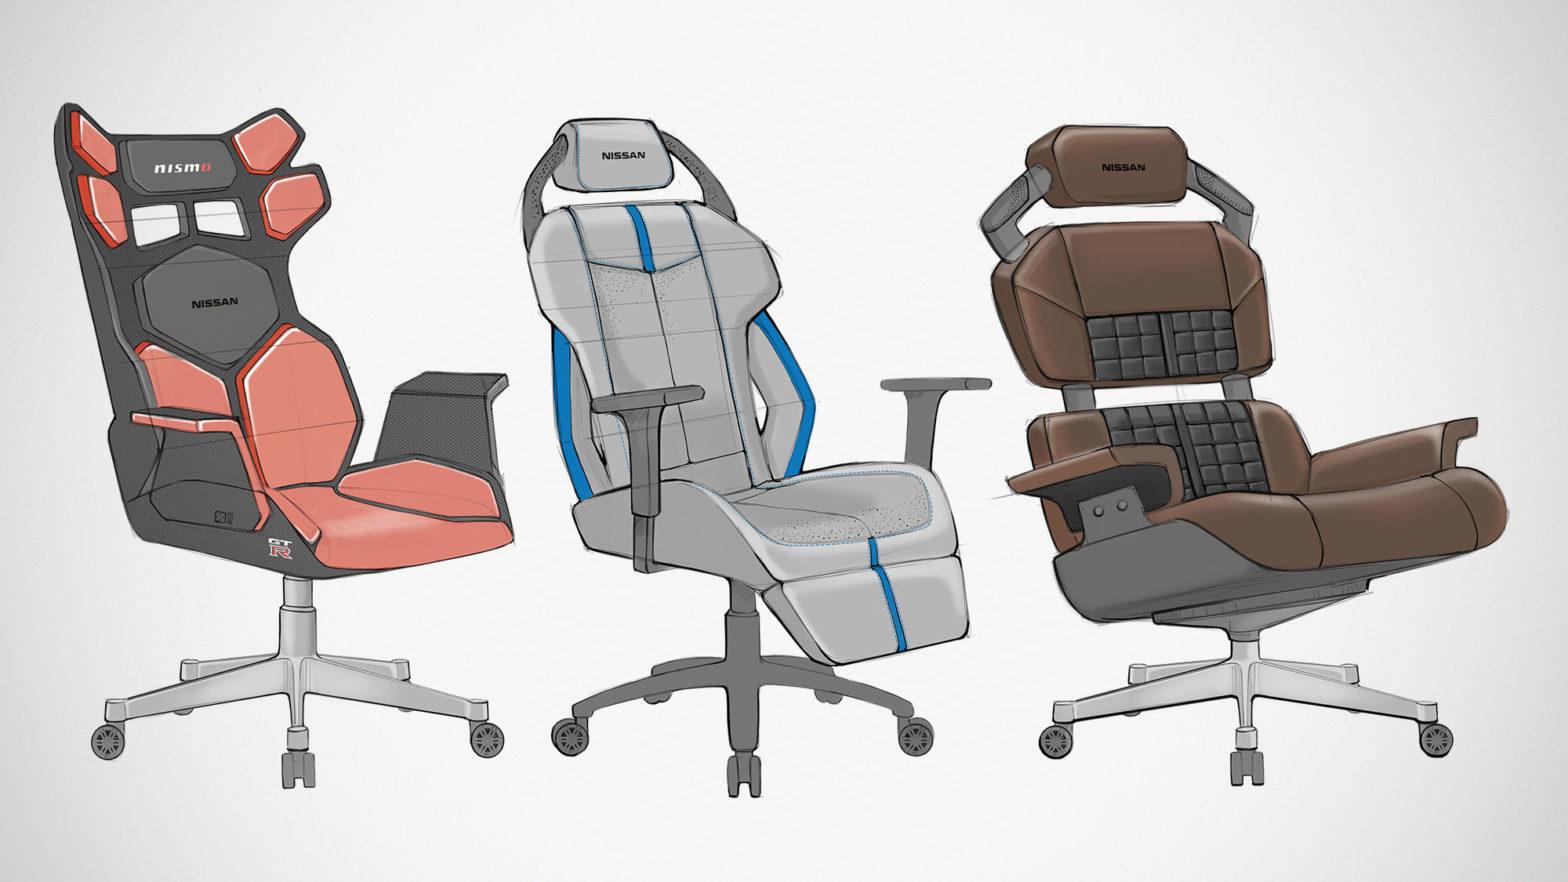 Nissan Esports Gaming Chairs